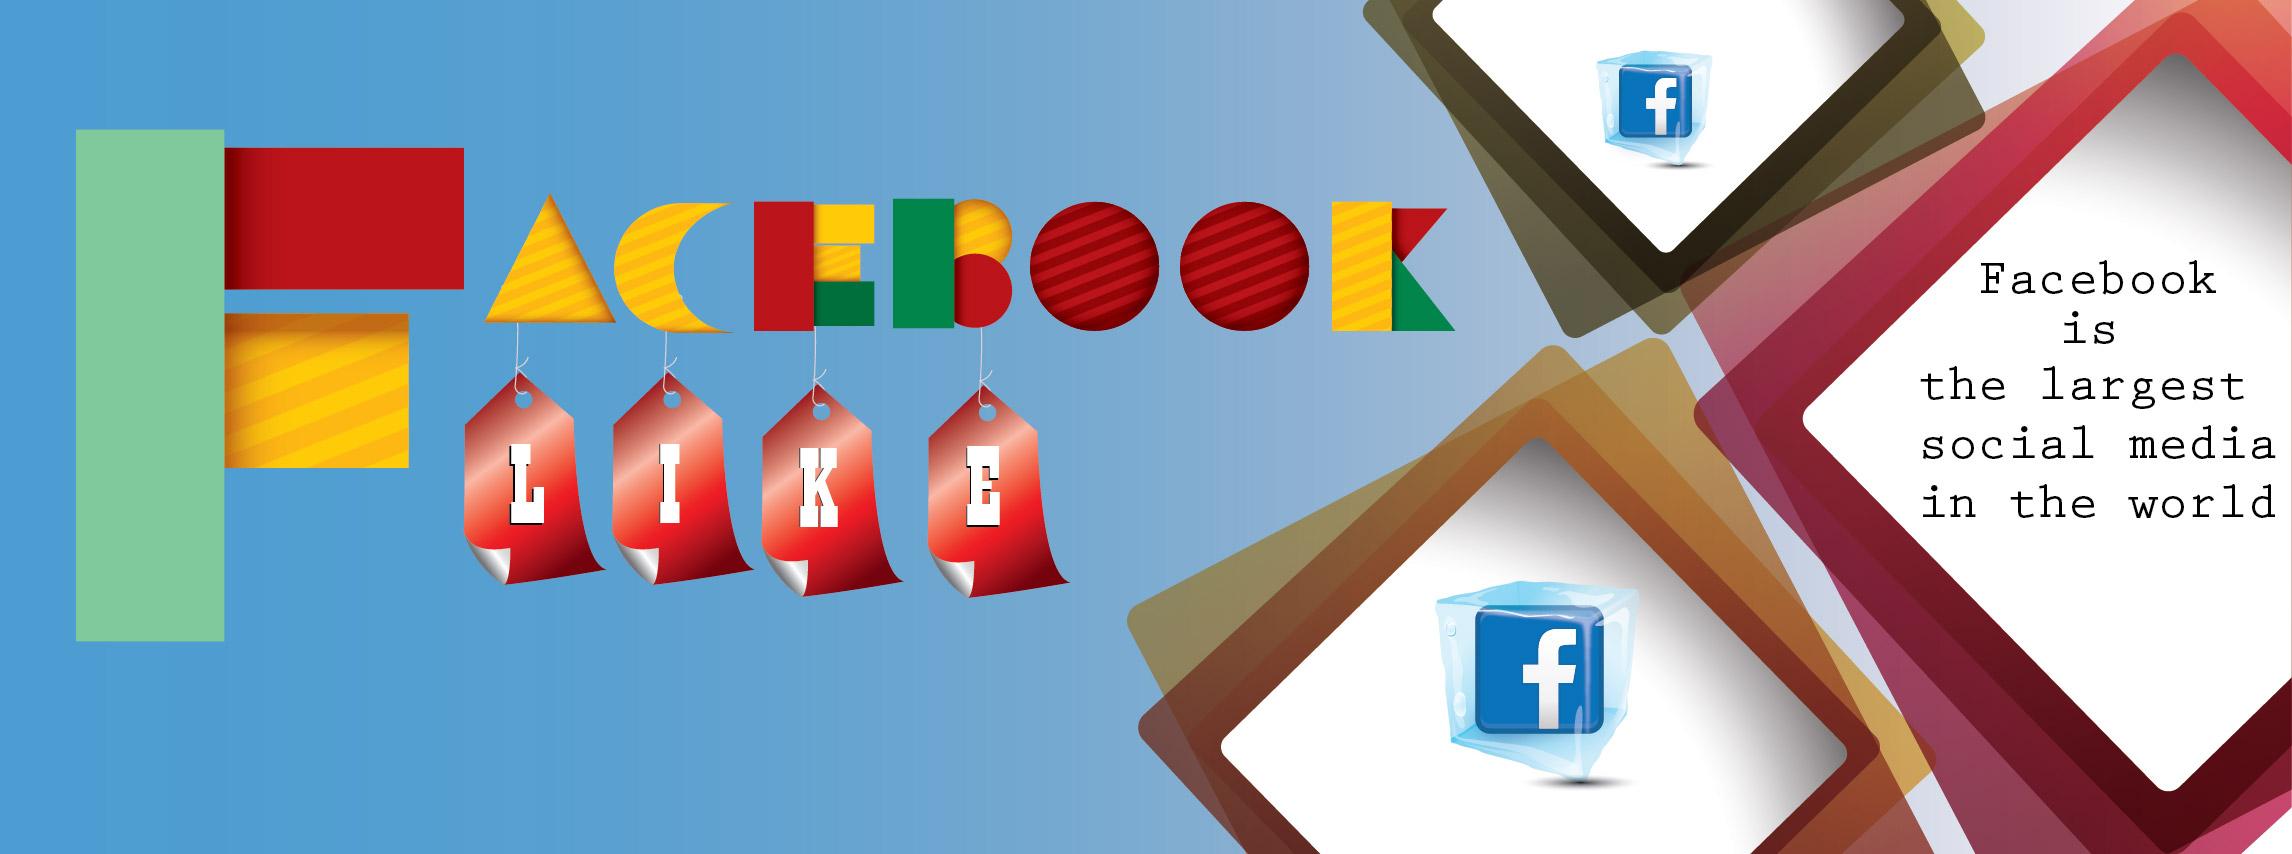 Facebook Marketign For Photography Business